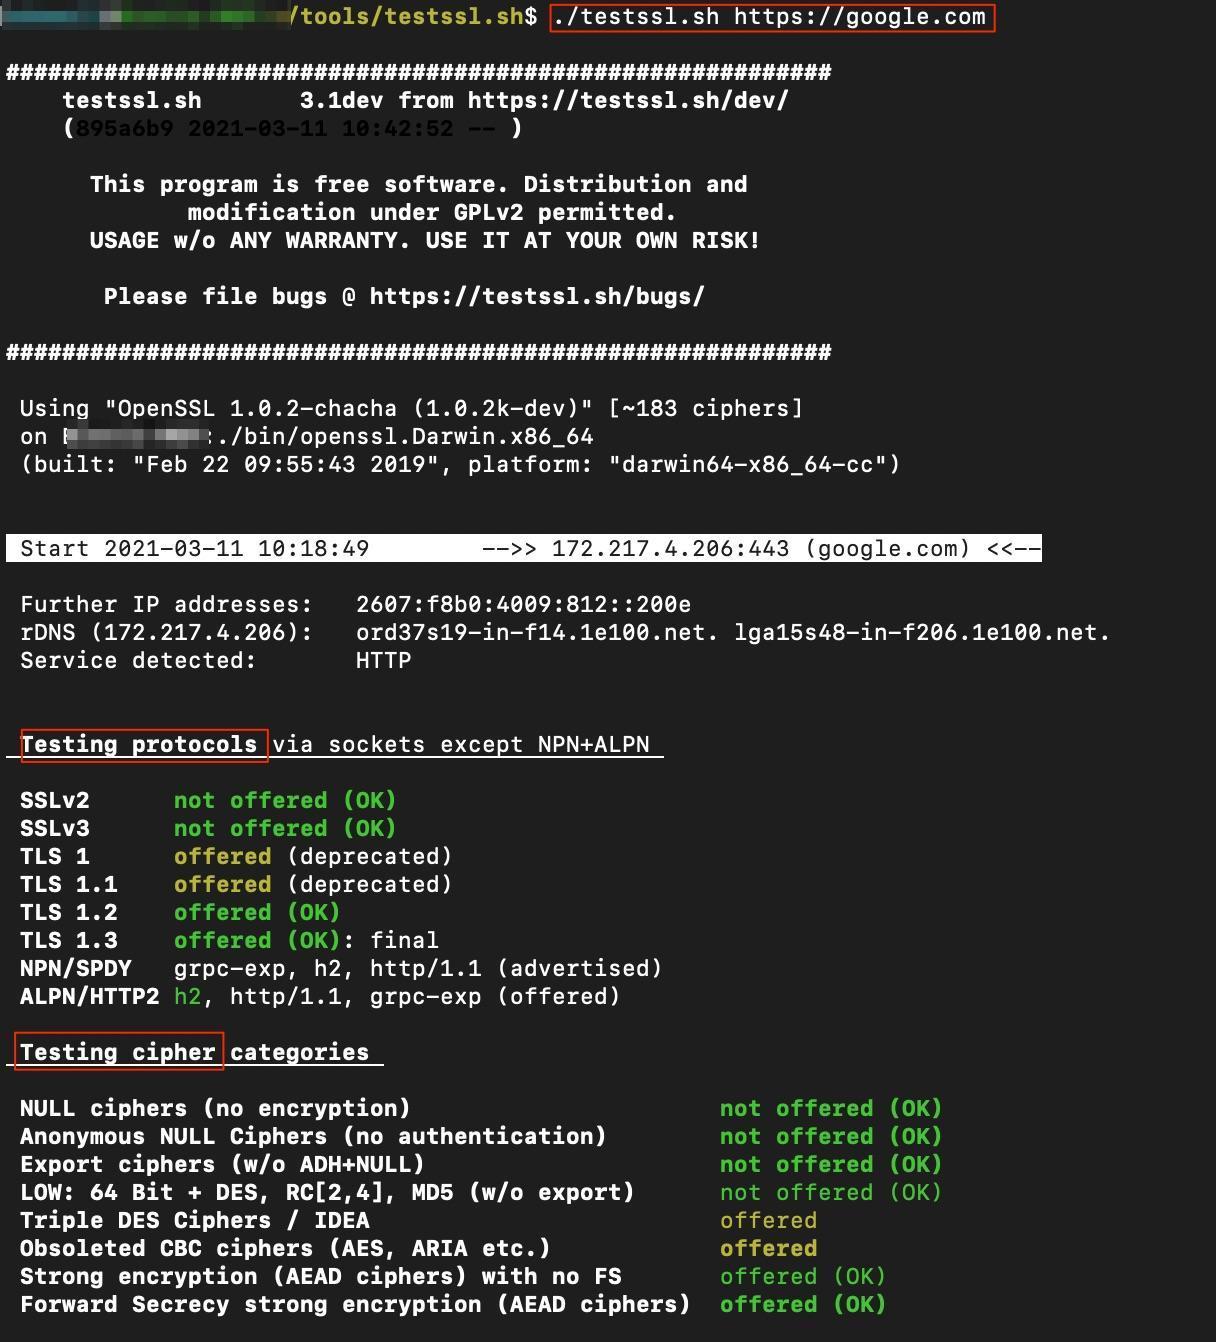 Screenshot of testssl.sh testing protocols & testing ciphers by white oak security blog.